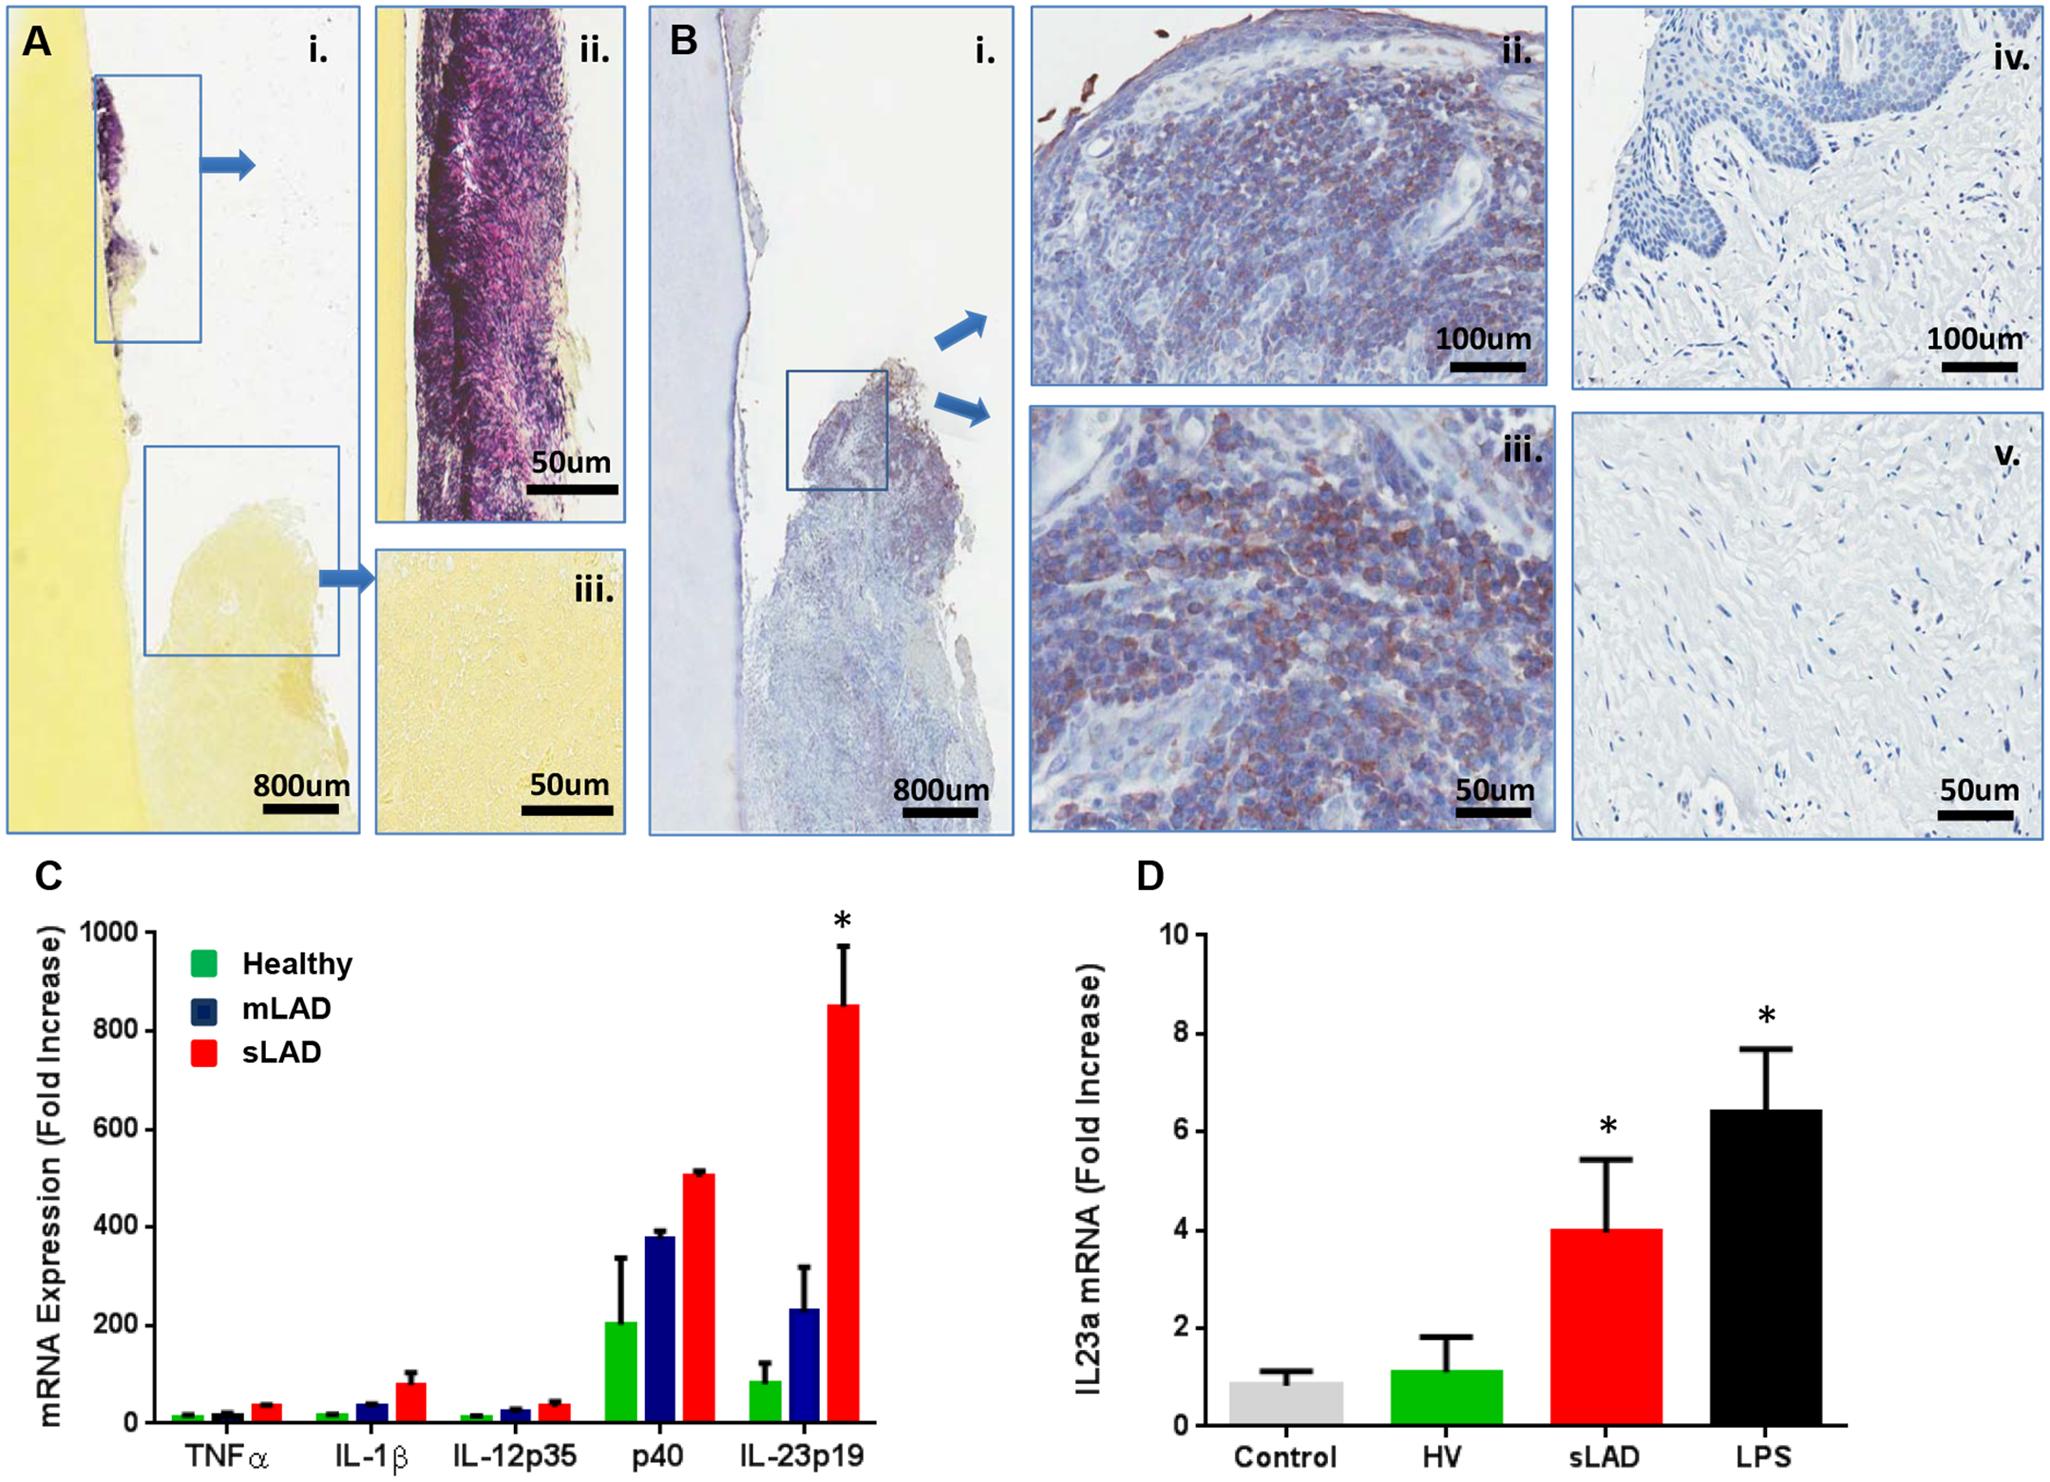 Immunostimulatory potential of LAD- associated dental plaque.